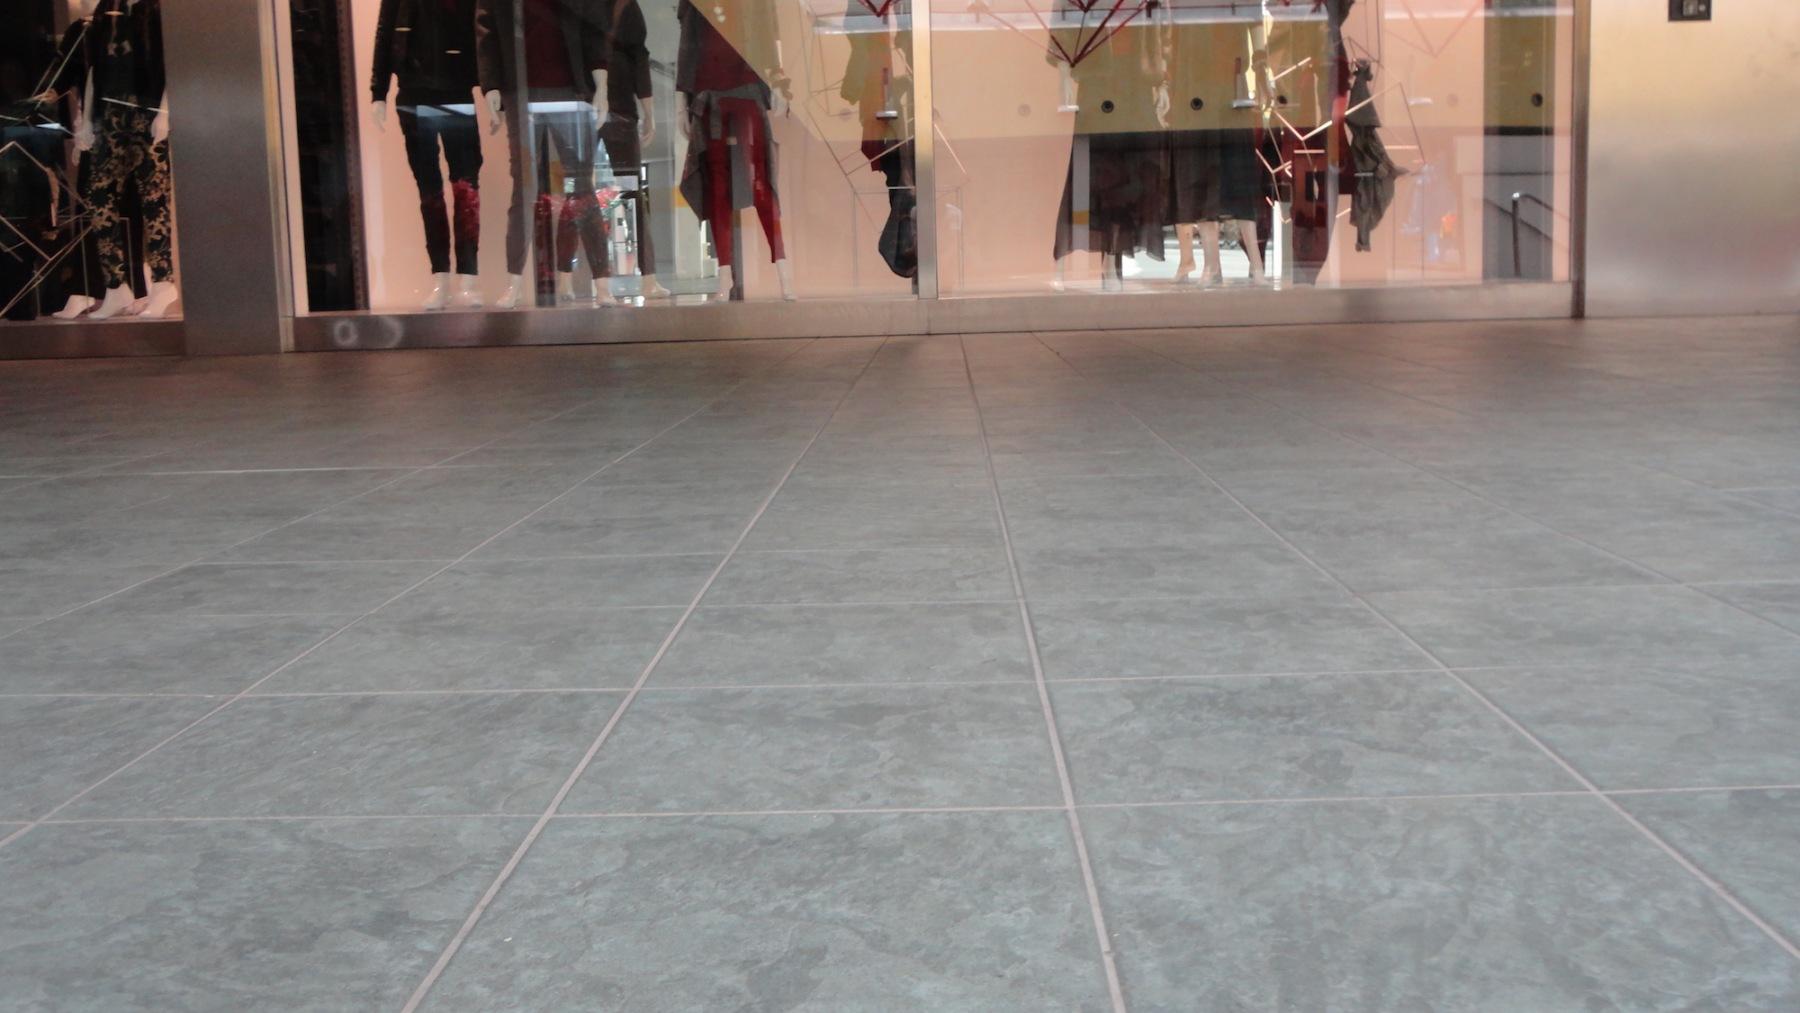 centro-commerciale-residenziale-Parco-Citta-Vicenza-12